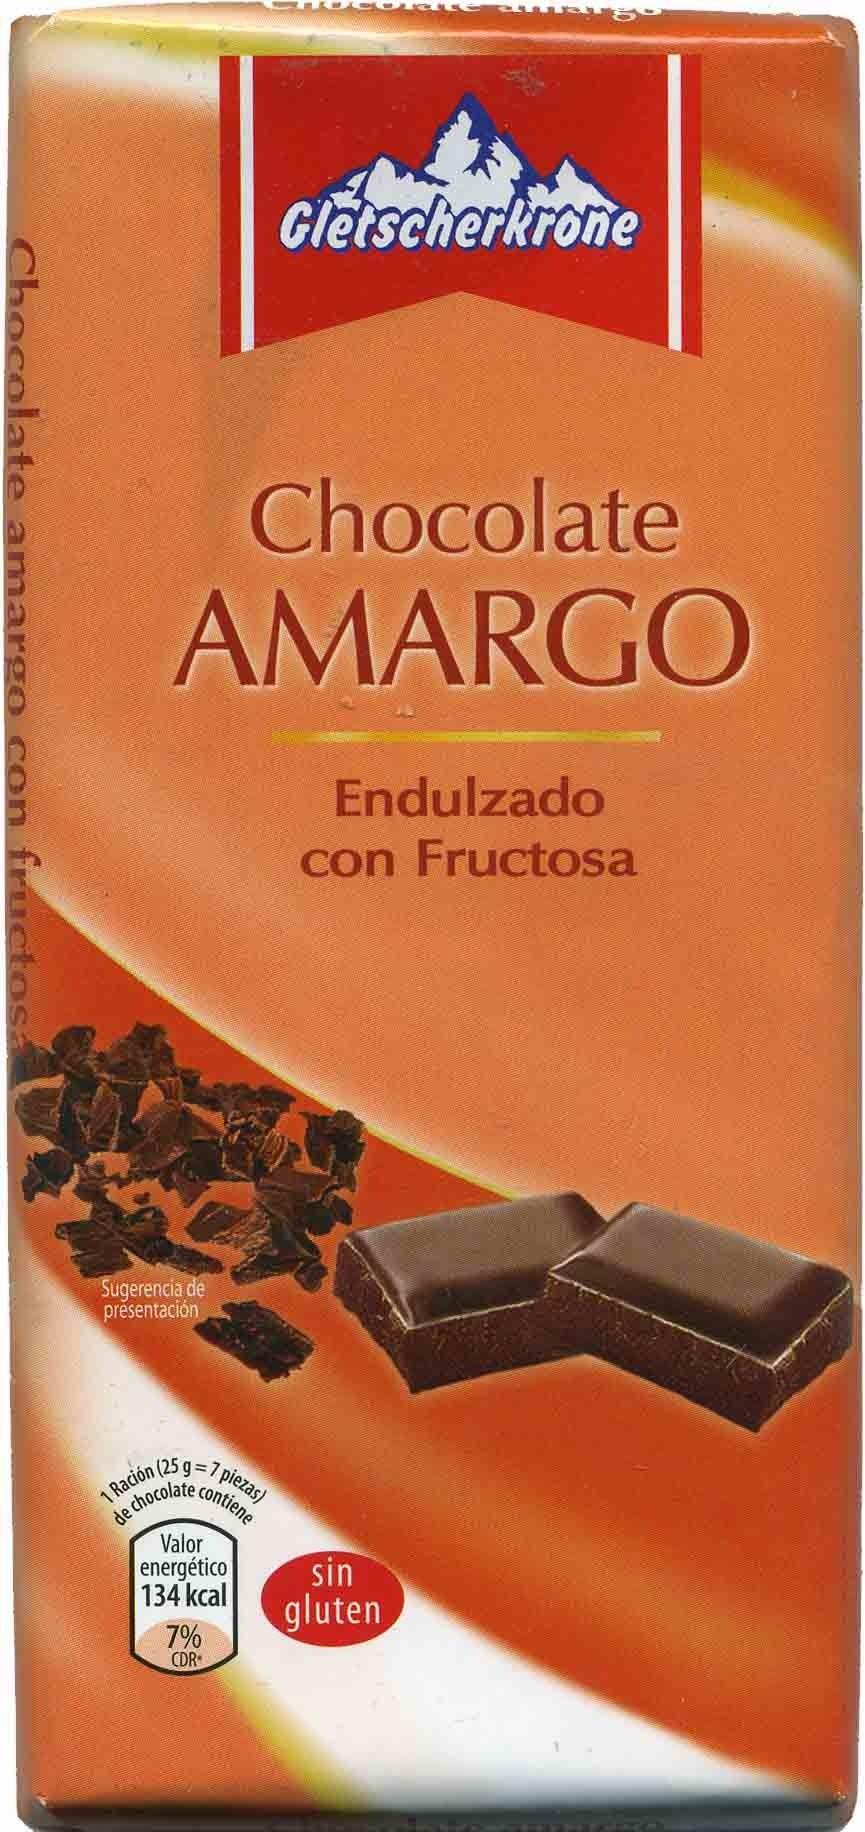 Tableta de chocolate negro con fructosa 55% cacao - Product